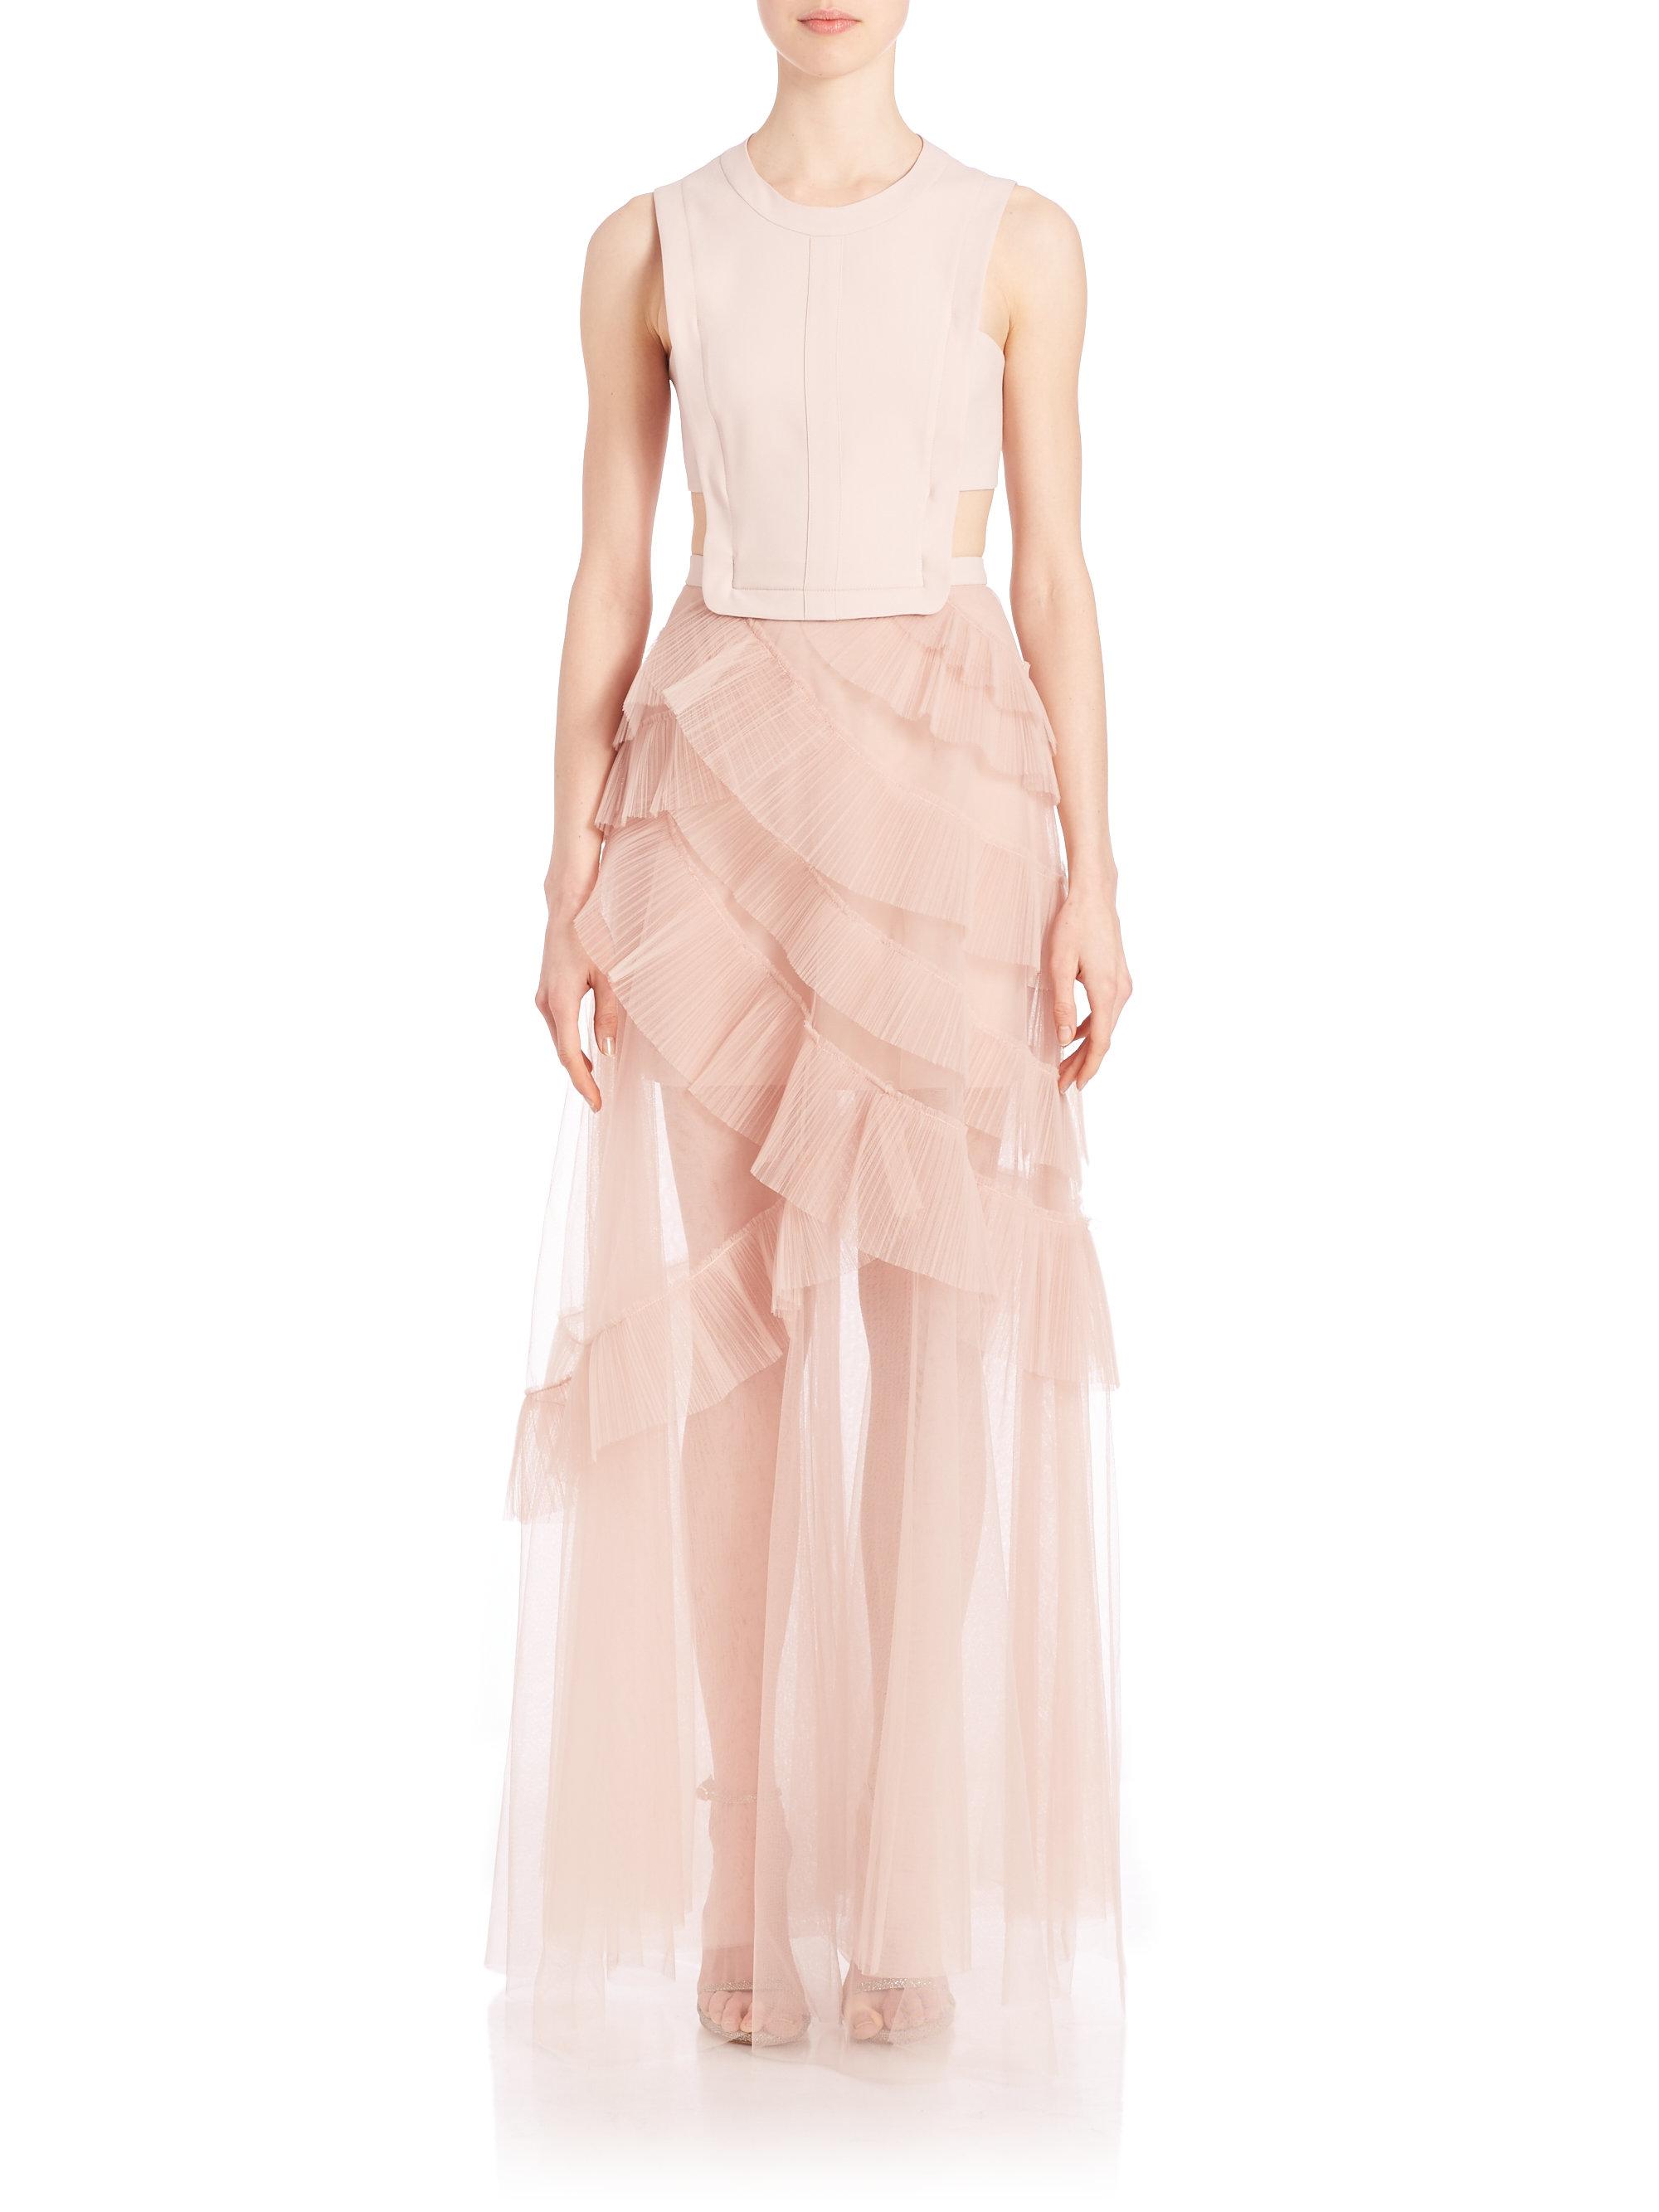 Lyst - Bcbgmaxazria Avalon Sheer Cutout Gown in Pink